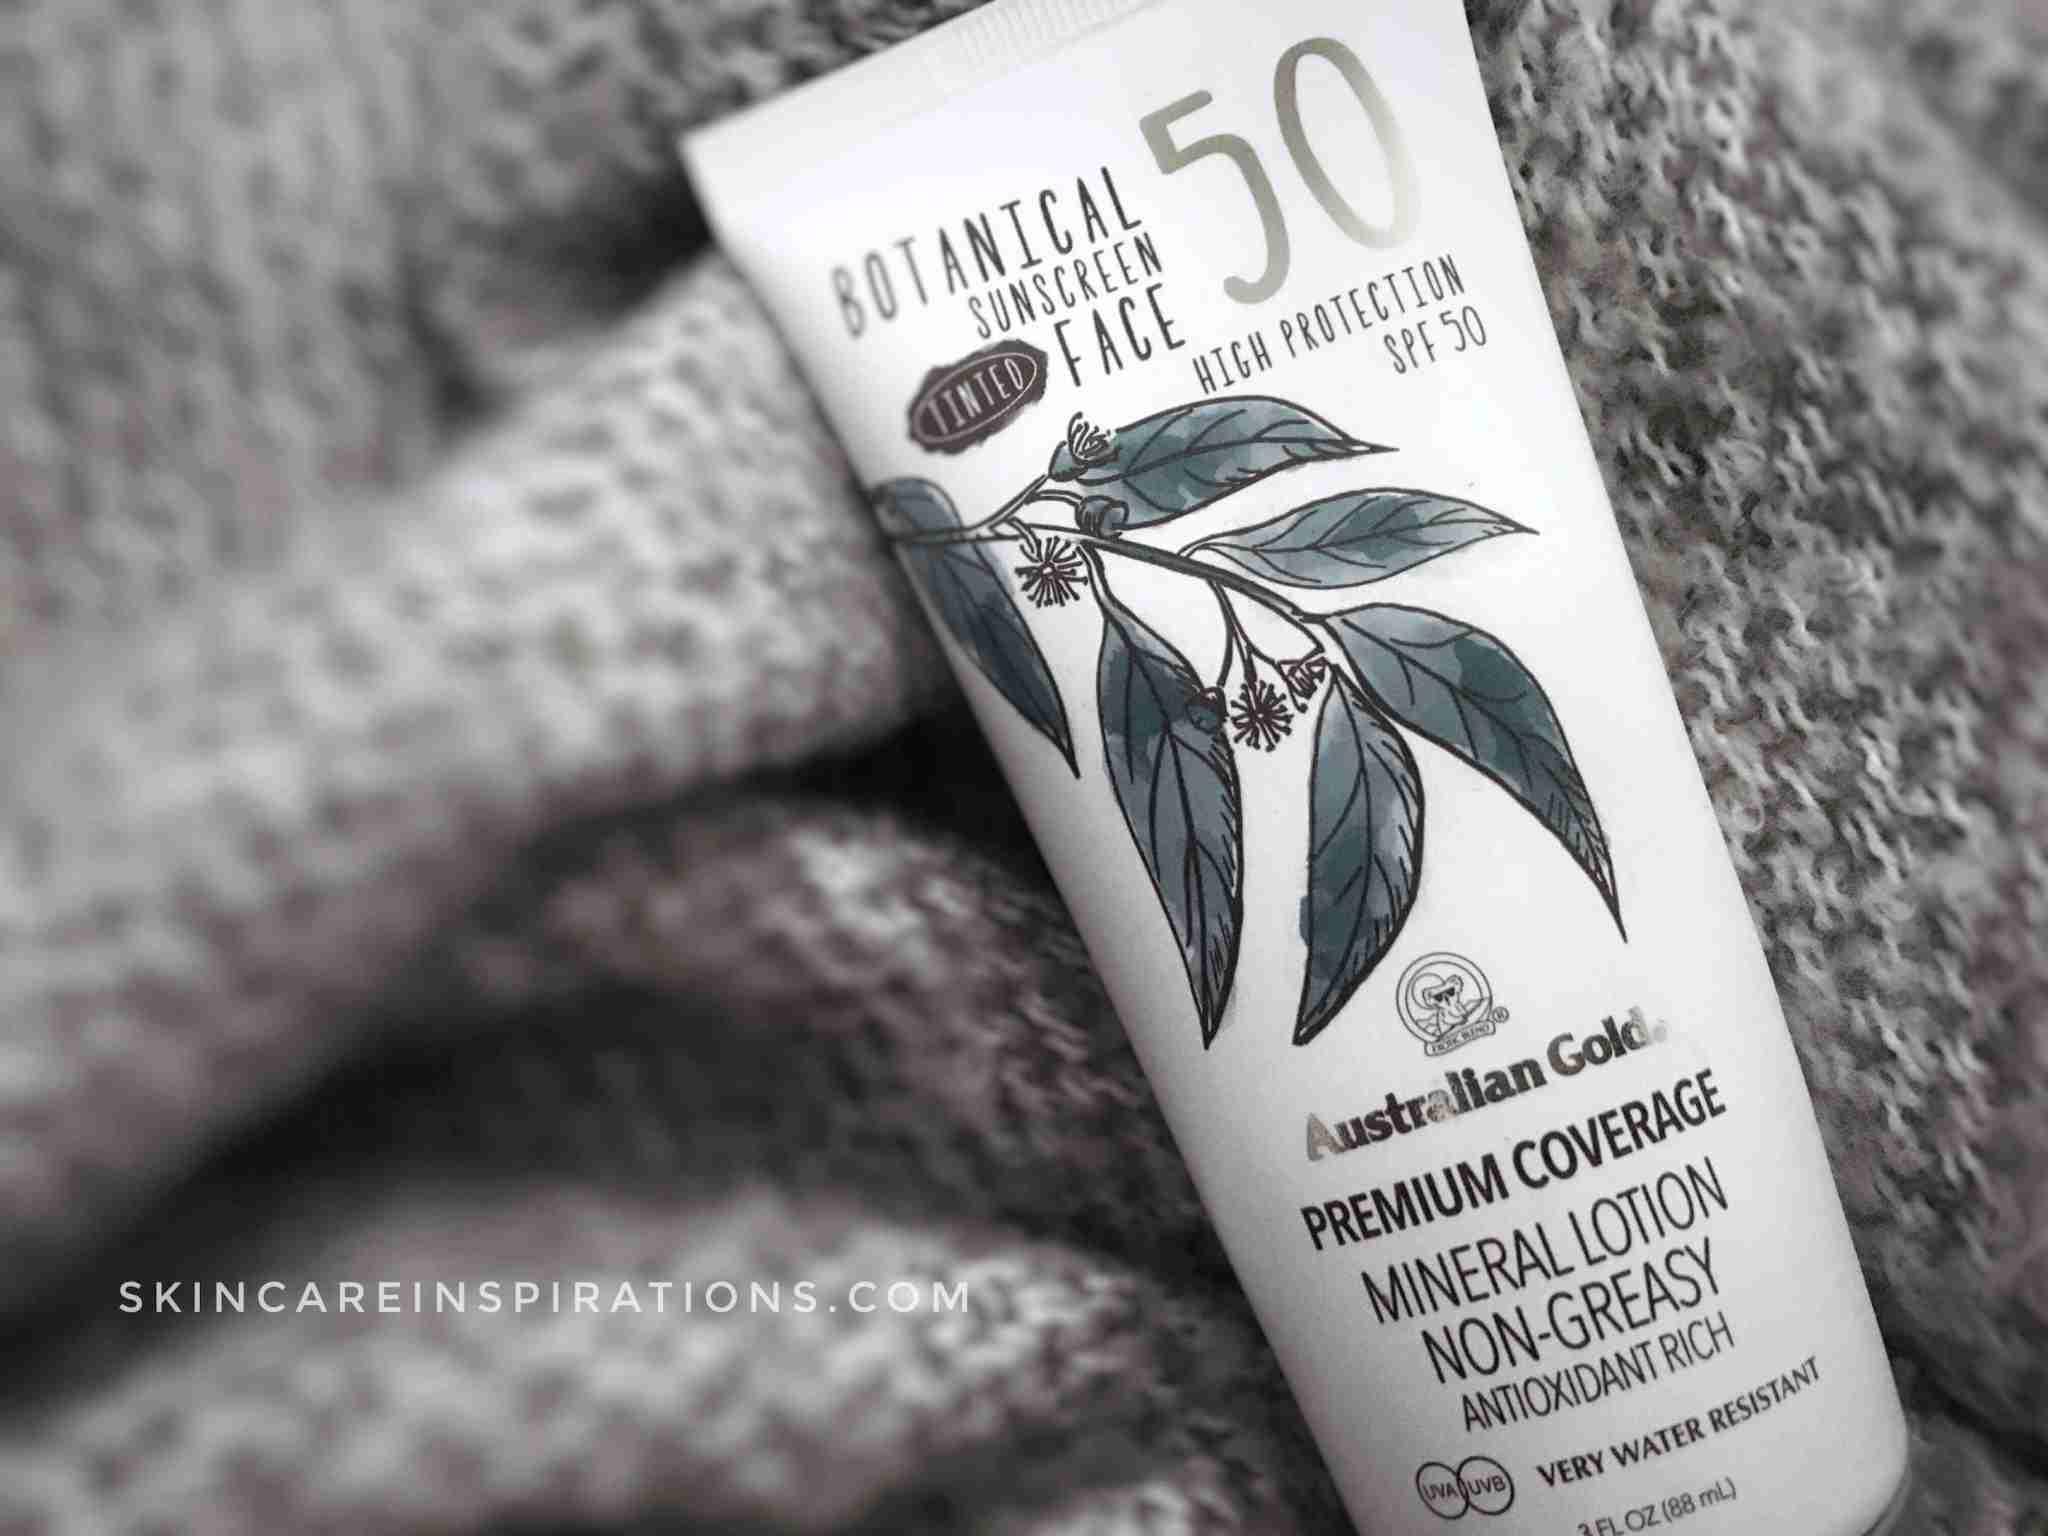 Mattierende Sonencreme für fettige Haut Australian Gold Botanical Sunscreen Face Swaches 1